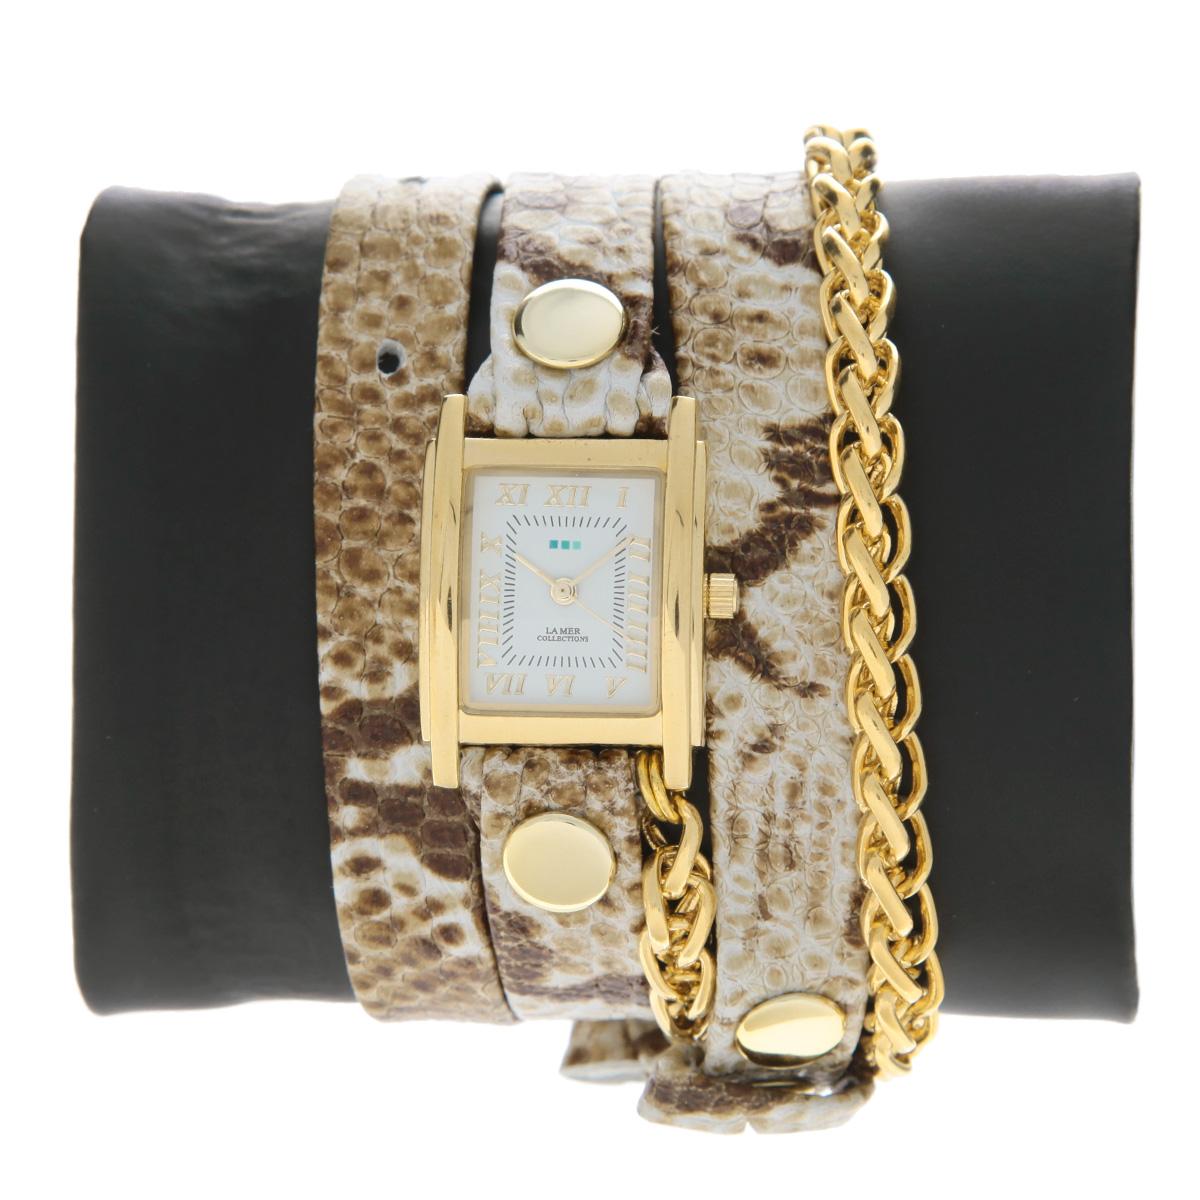 "Часы наручные женские La Mer Collections ""Chain Motor White Brown Snake Gold"". LMSCW2014x ( LMSCW2014x )"